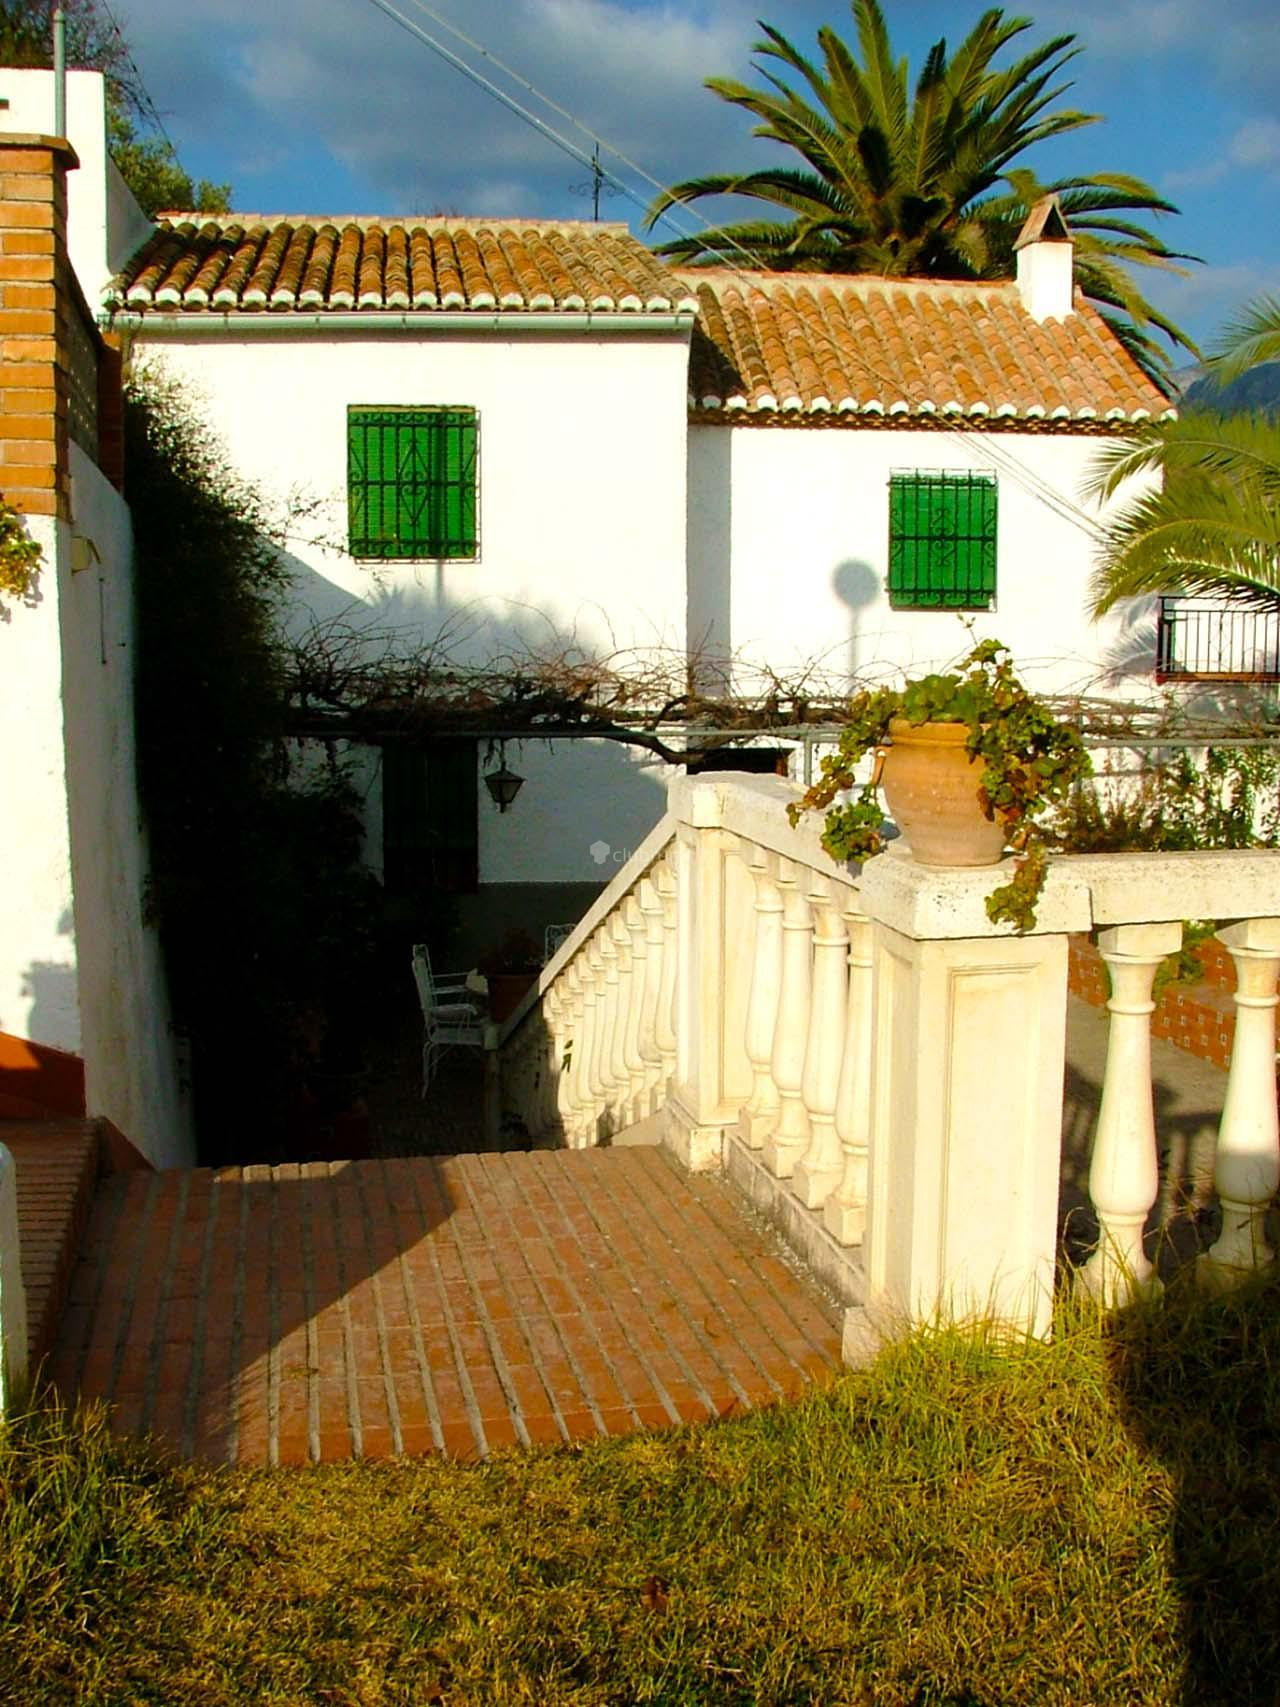 Fotos de casa de josefina granada durcal clubrural for Casa relax granada